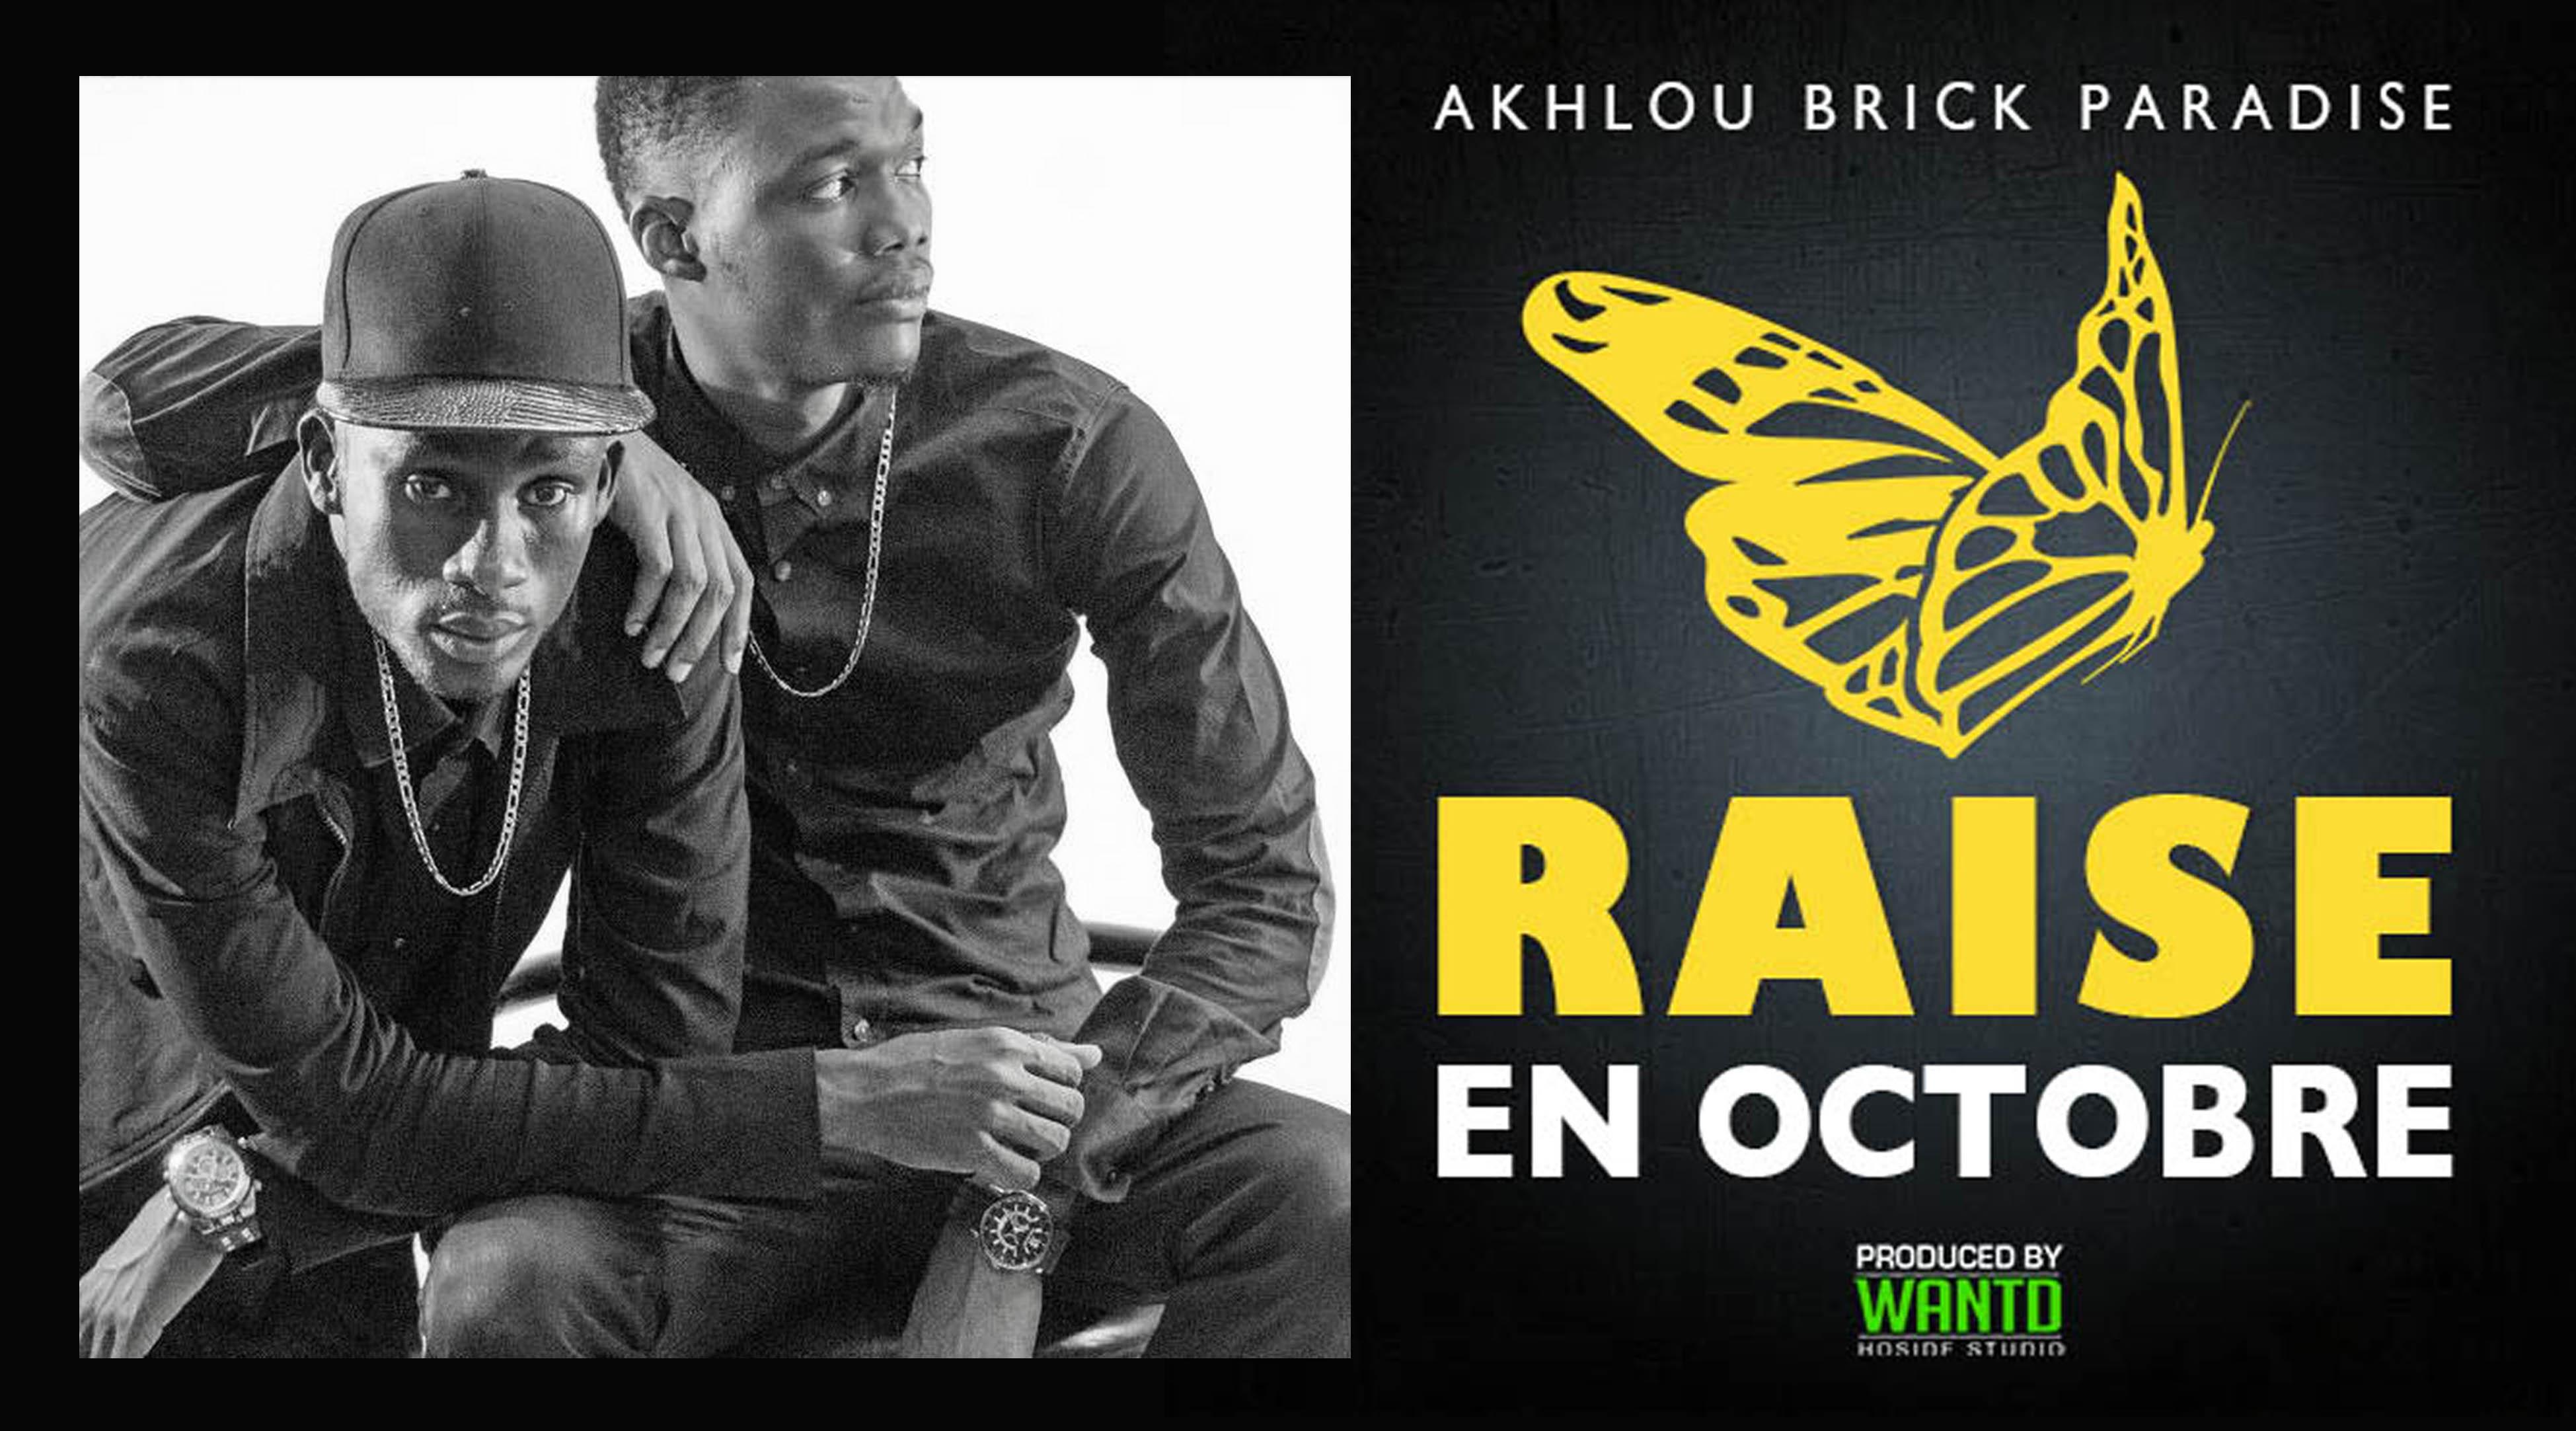 LE PREMIER ALBUM DE AKHLOU BRICK, ENFIN EN OCTOBRE !